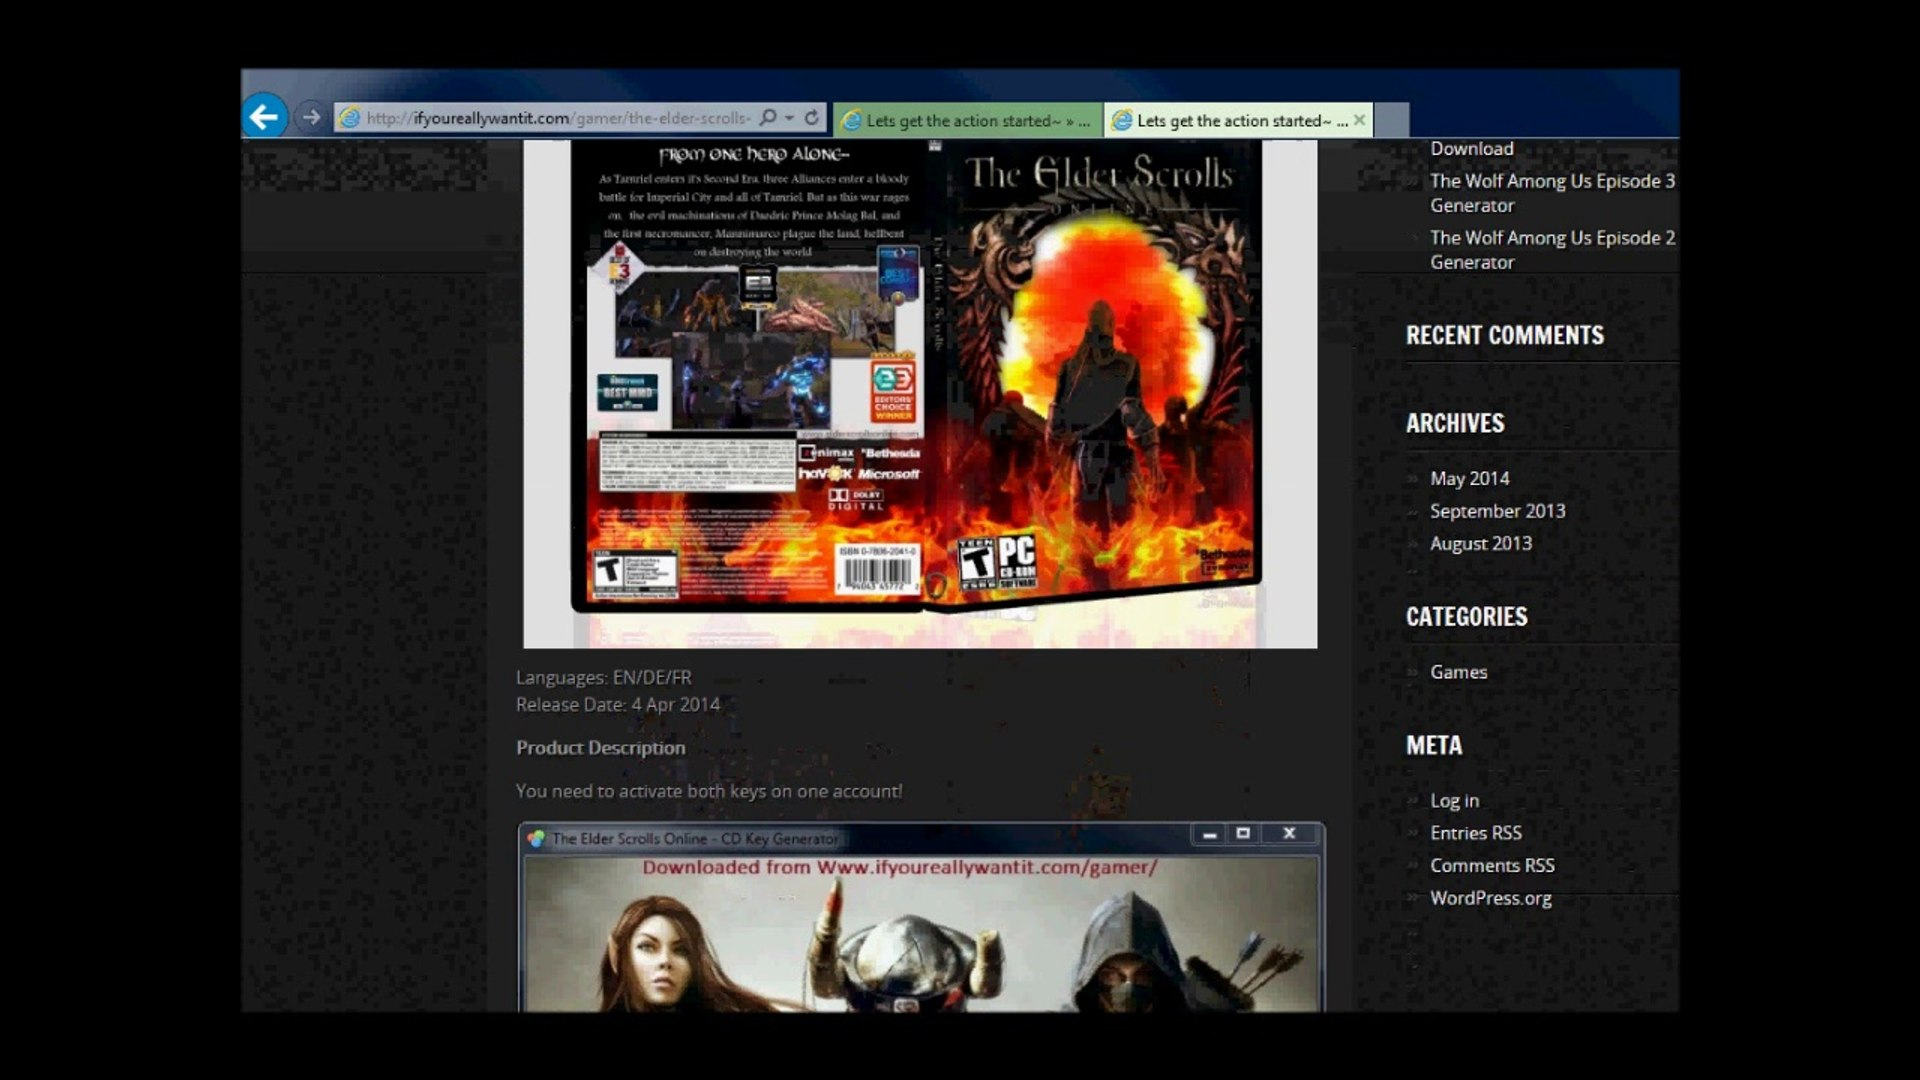 The Elder Scrolls Online UNDetected HACK - CHEAT MOD 2014